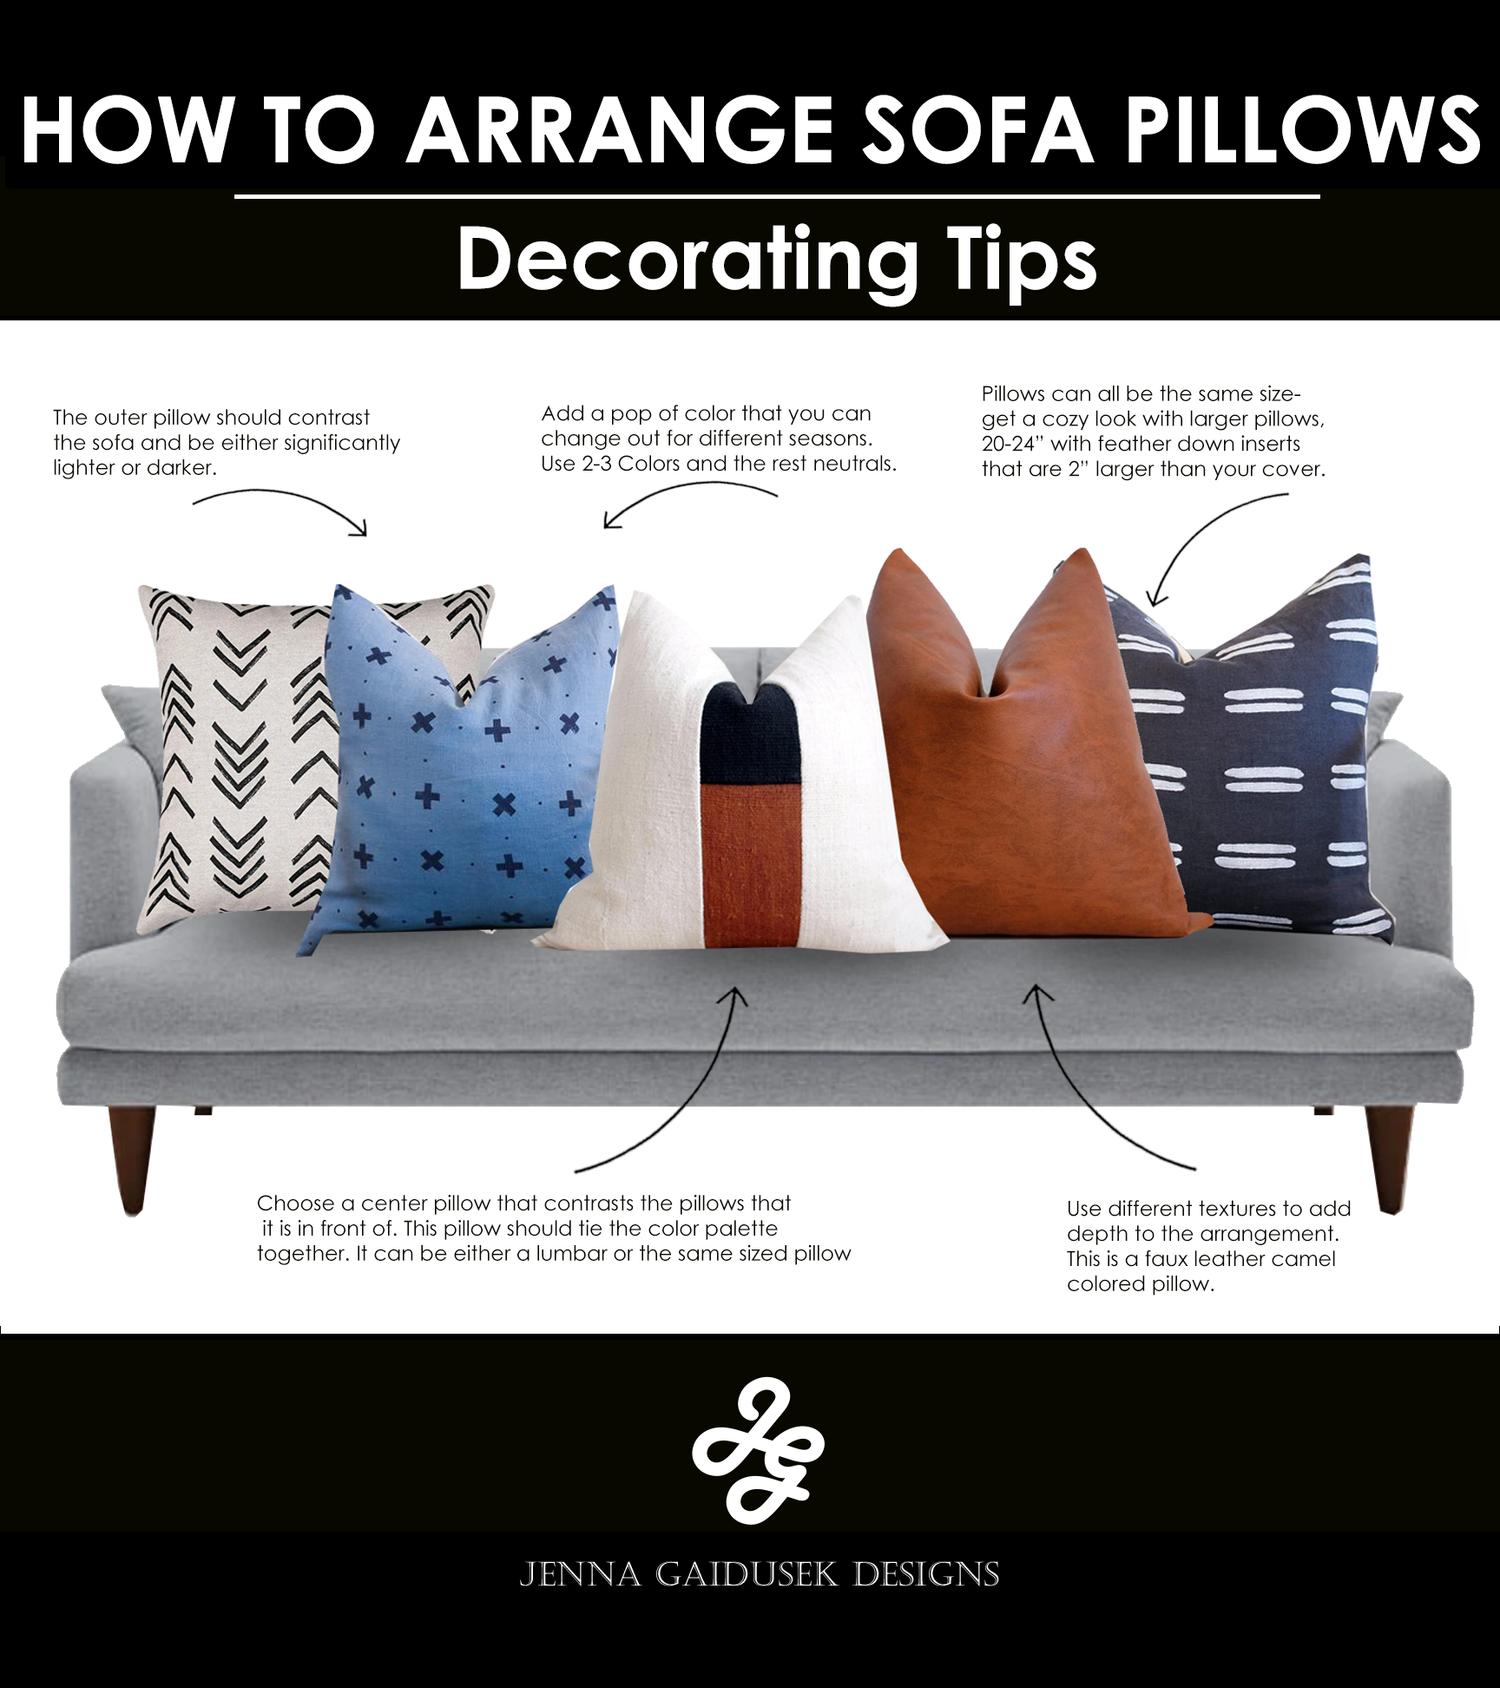 HOW TO STYLE YOUR SOFA PILLOWS — Jenna Gaidusek Designs